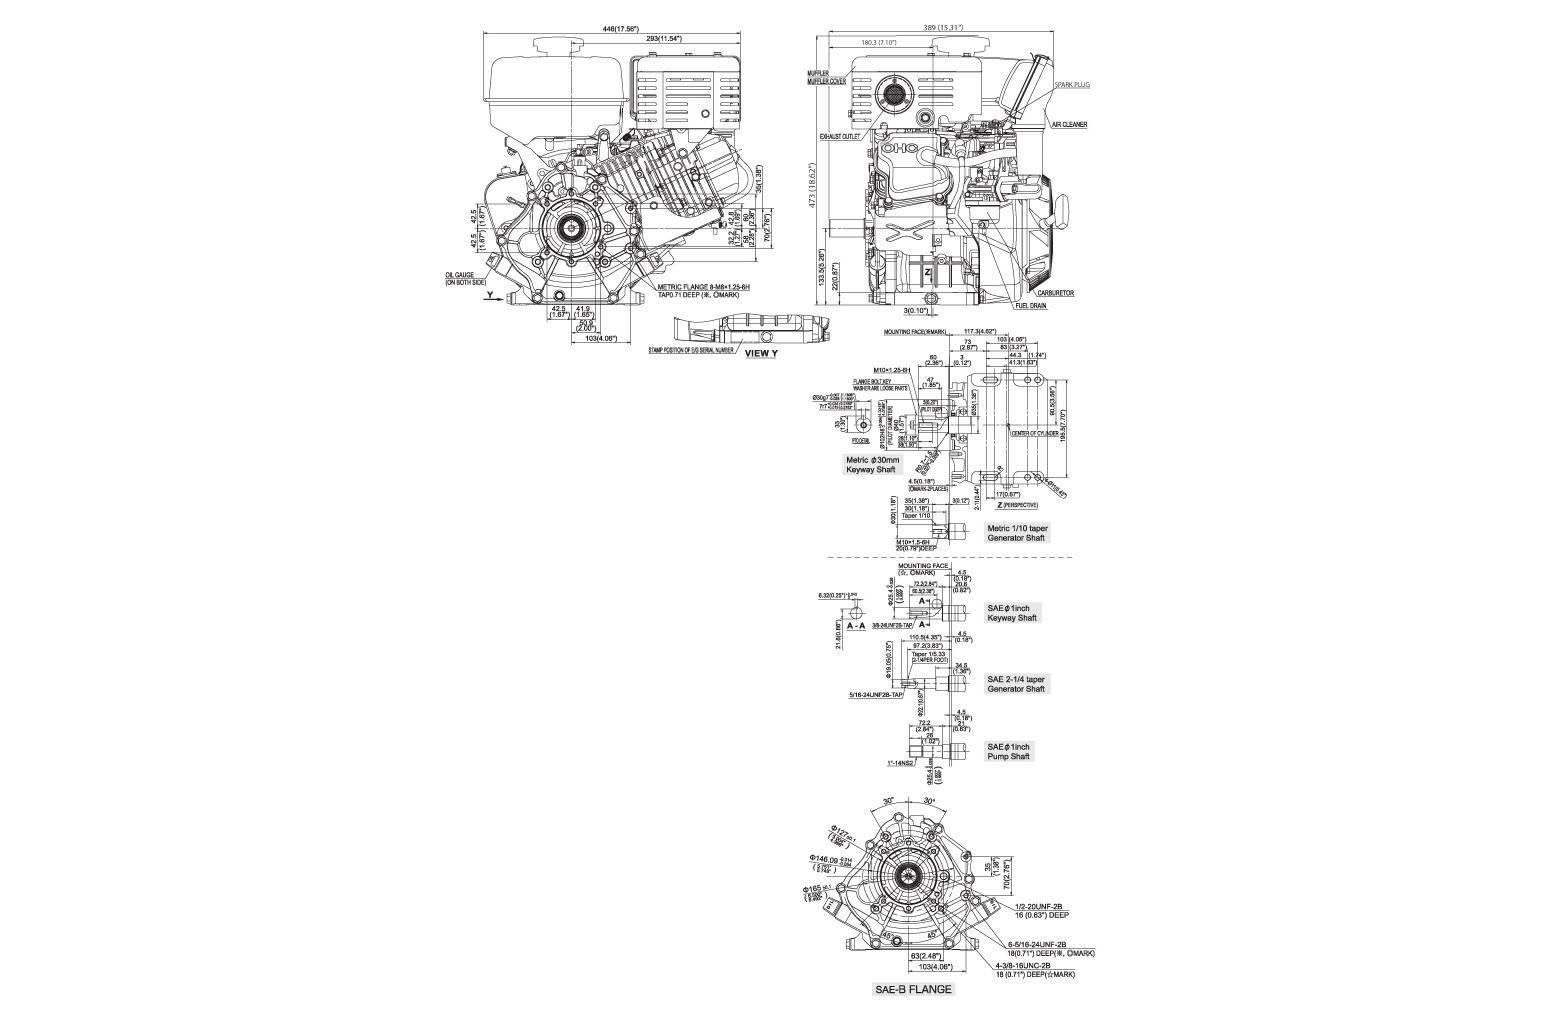 2017 robin subaru ex40 for sale in edmonton ab alberta small rh albertasmallengine com 25 HP Robin Subaru Engine Subaru Robin Engine Parts